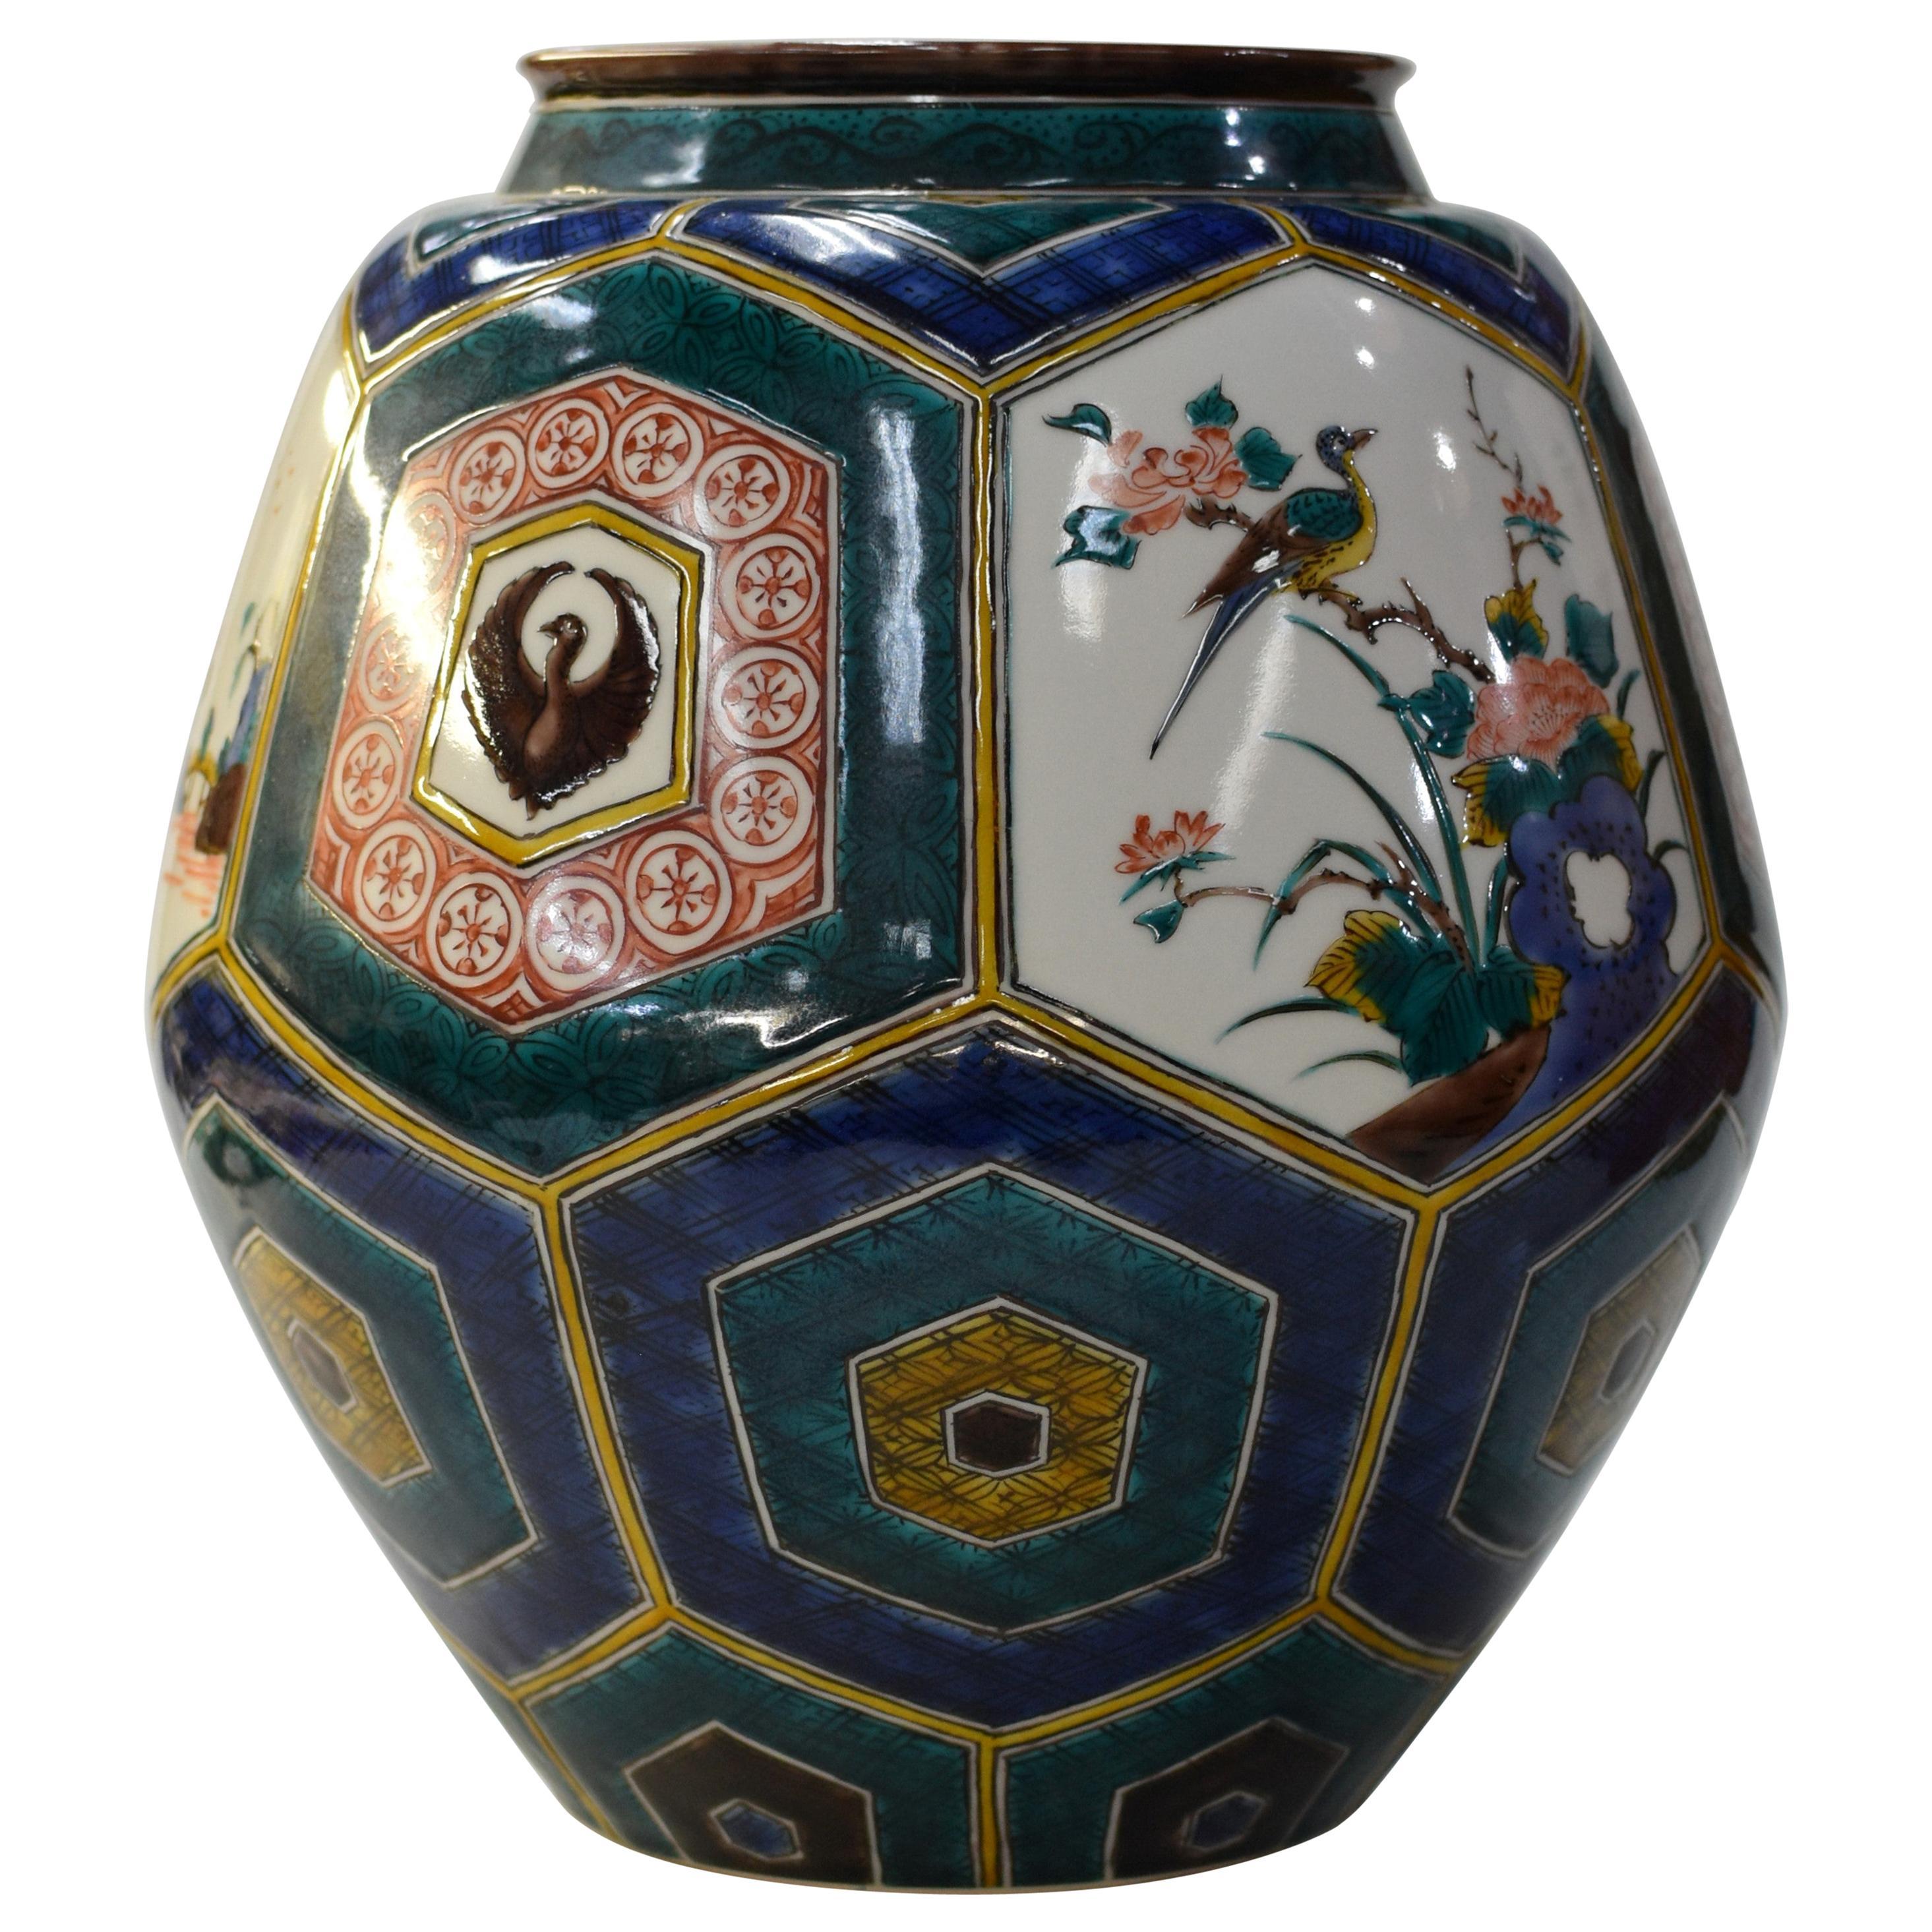 Japanese Blue Green Porcelain Vase by Master Artist